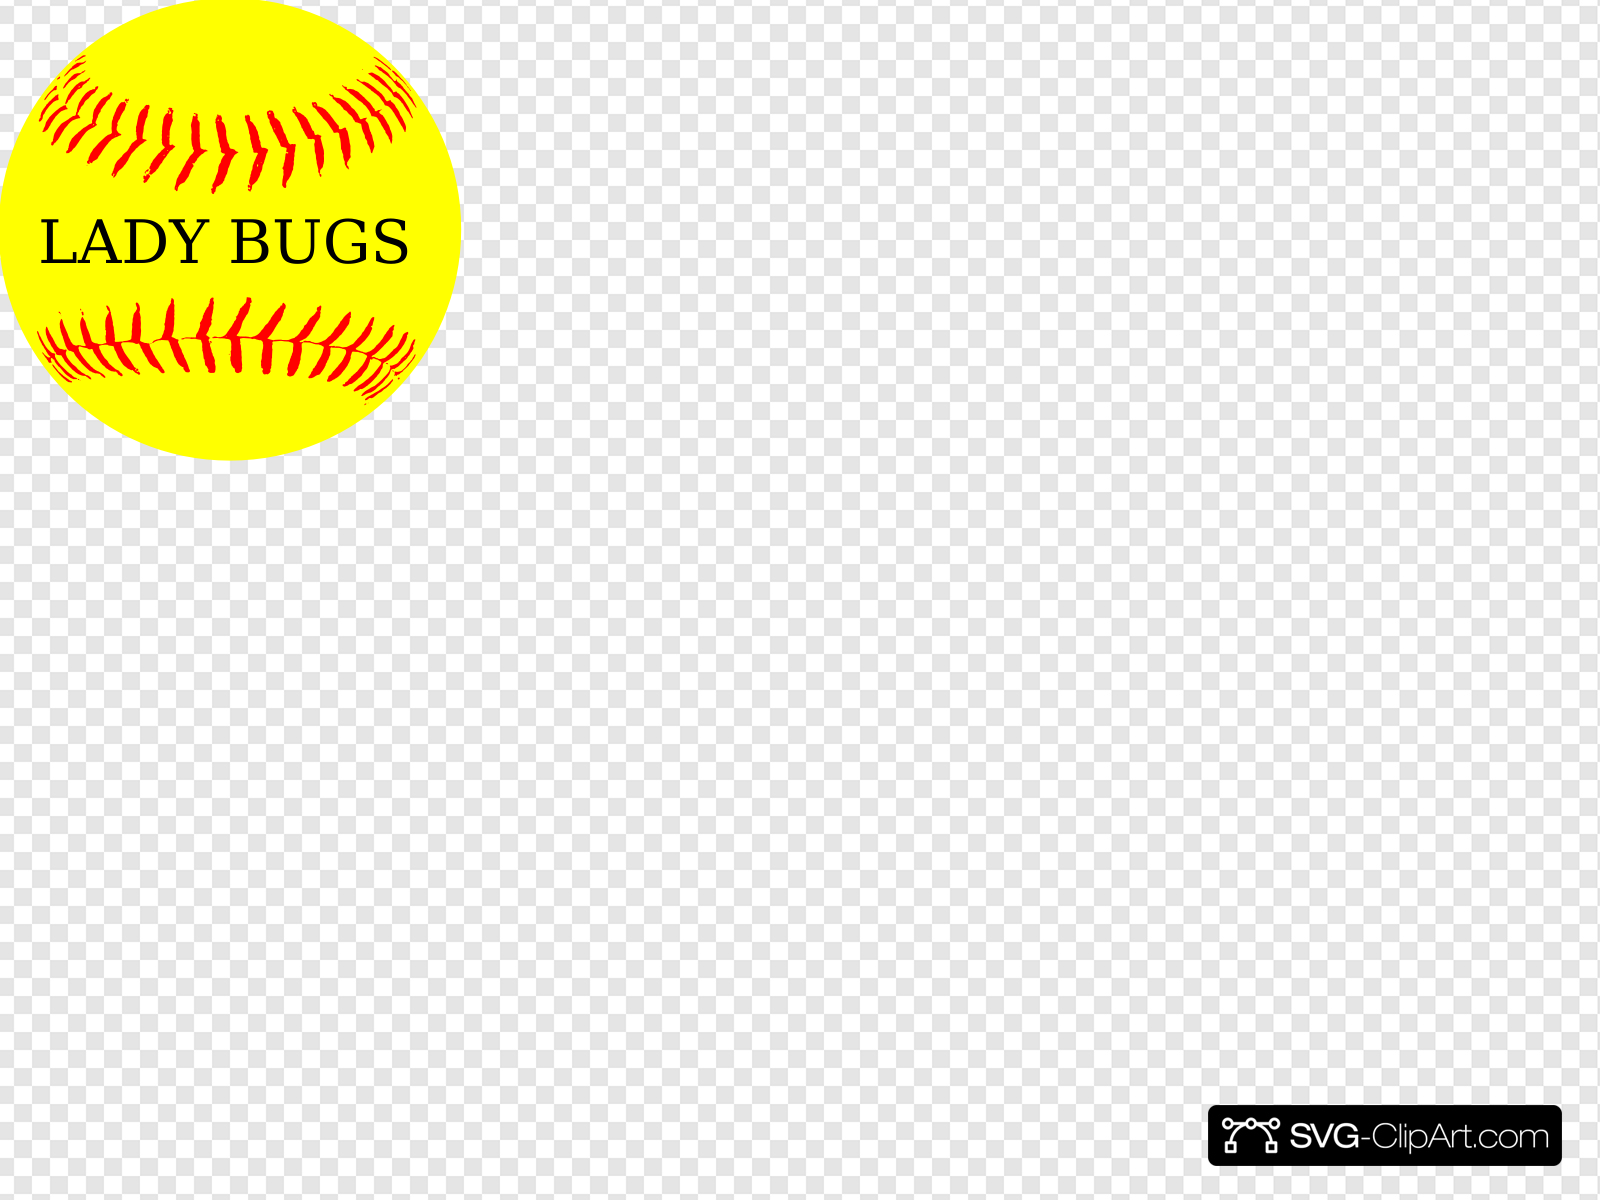 Lb clipart png library Yellow Softball Lb Clip art, Icon and SVG - SVG Clipart png library